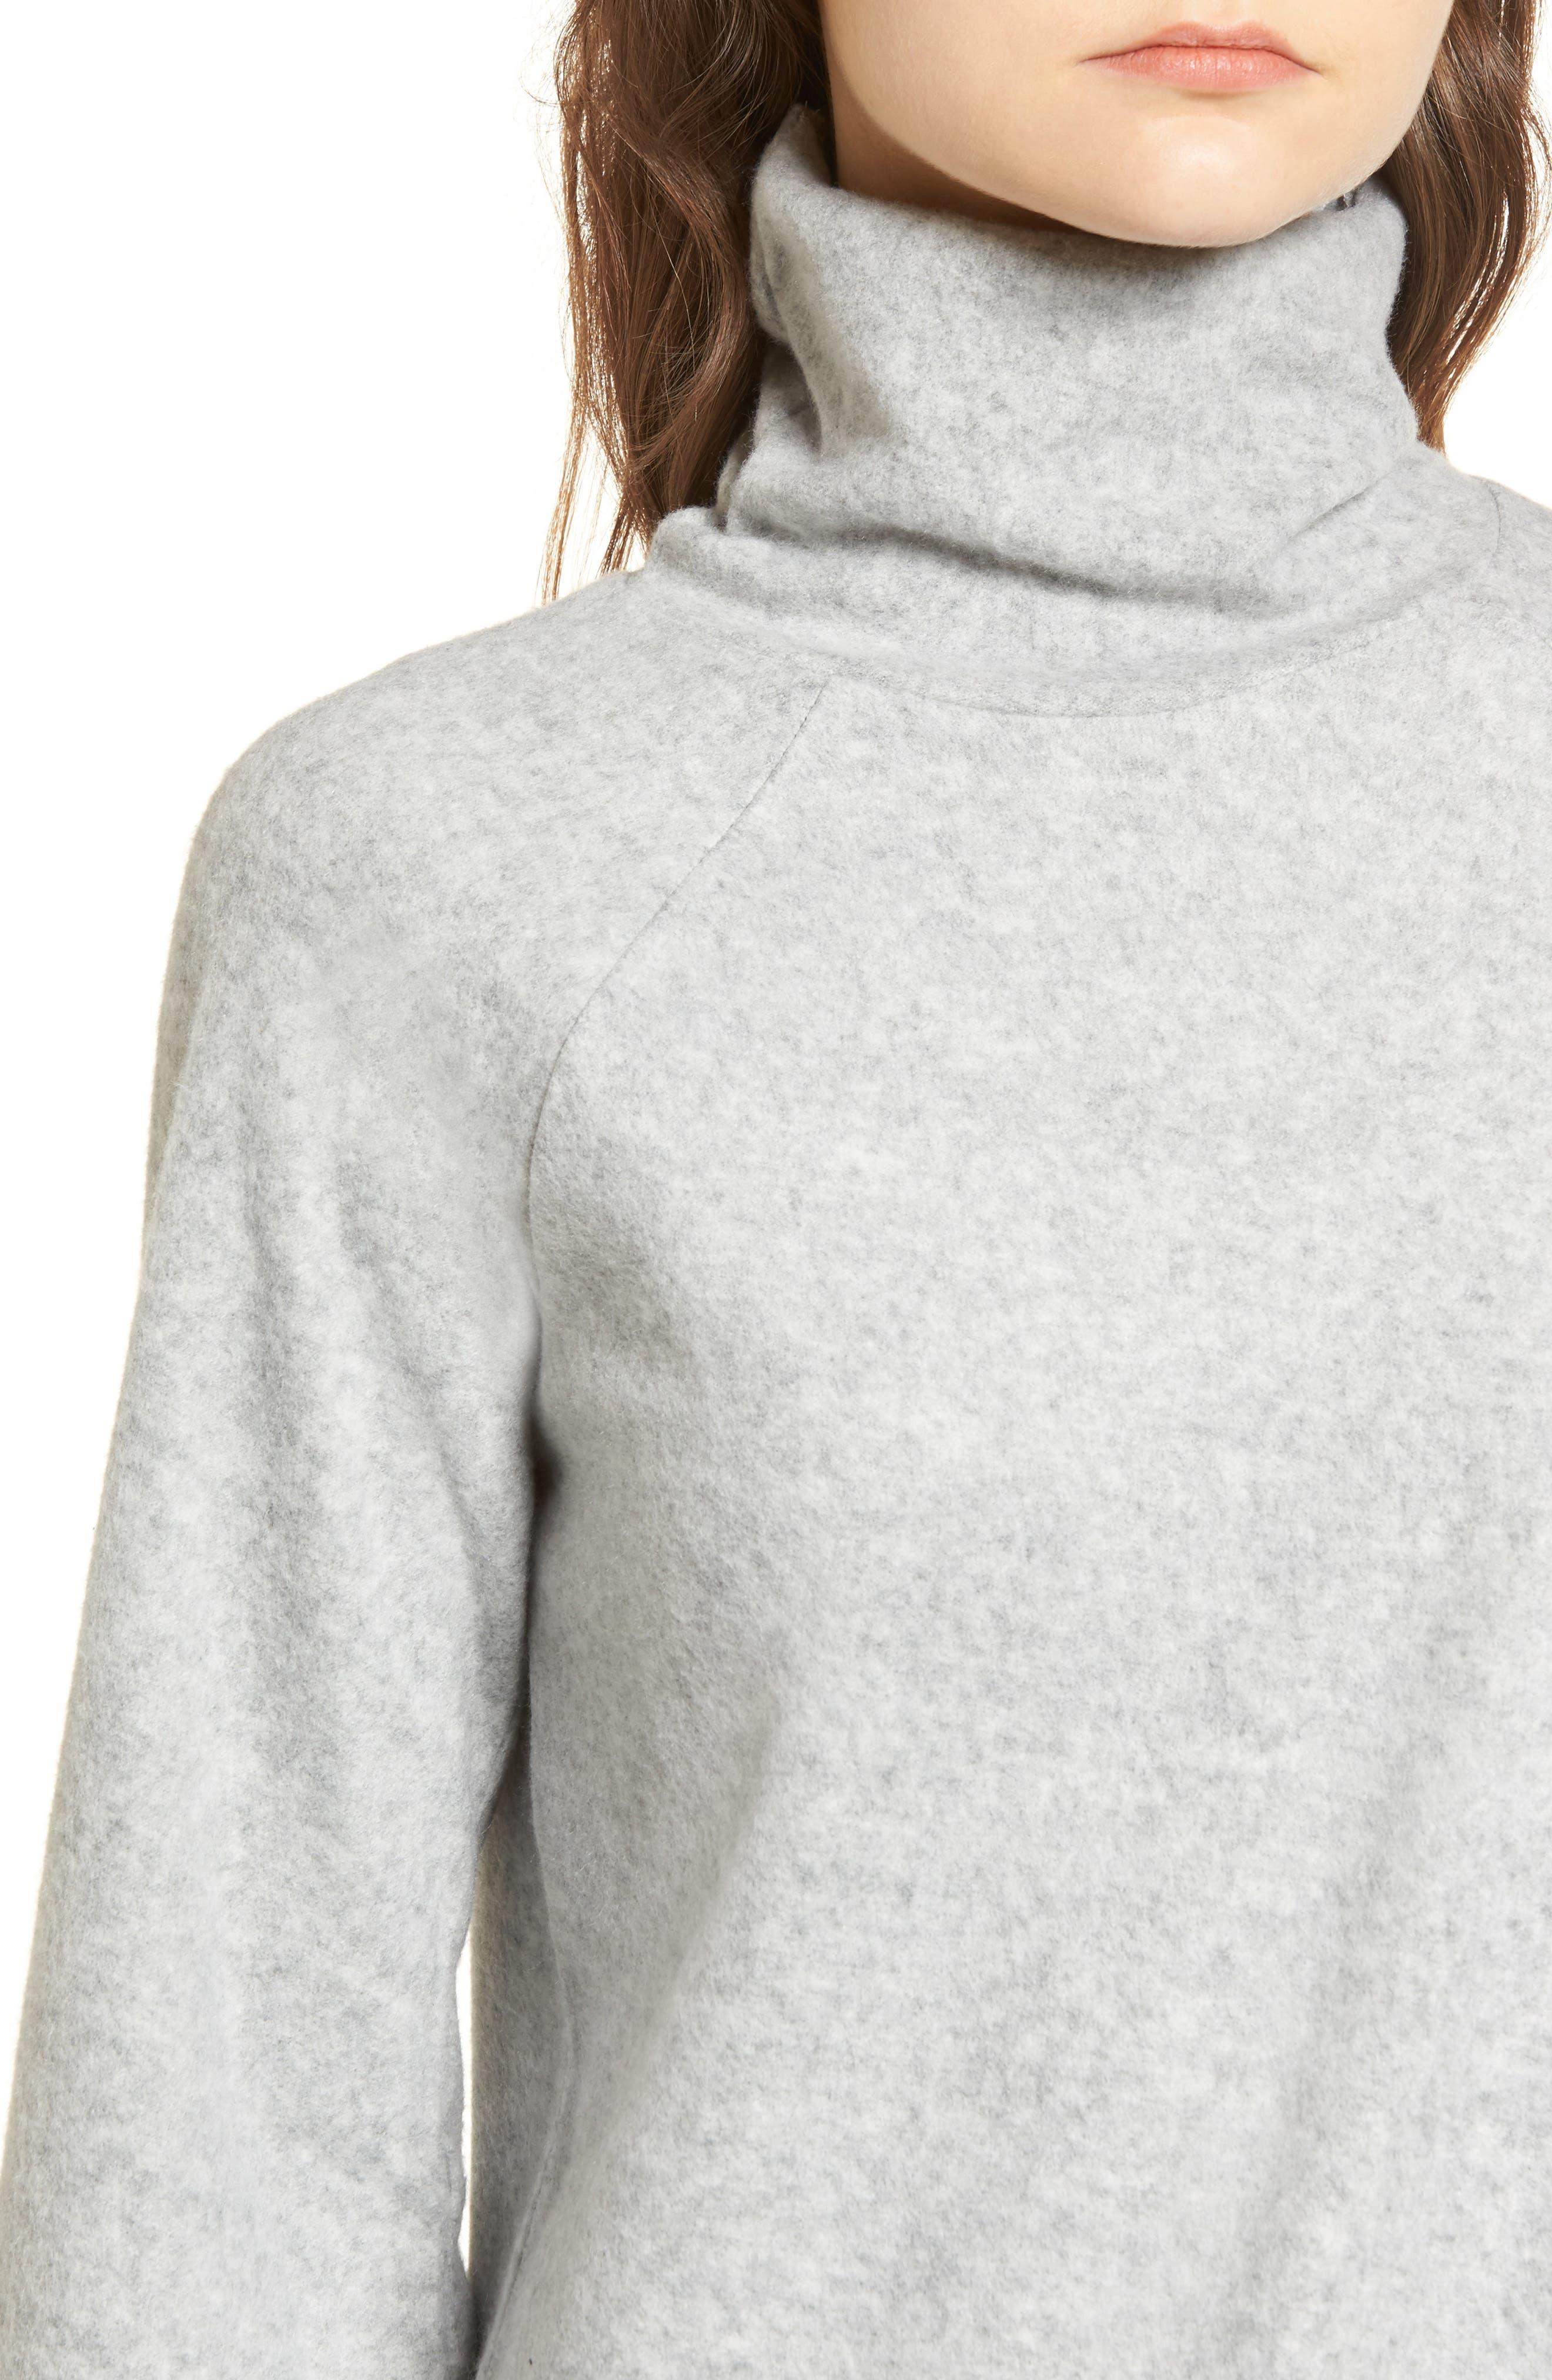 Bell Sleeve Sweatshirt,                             Alternate thumbnail 4, color,                             Grey Heather